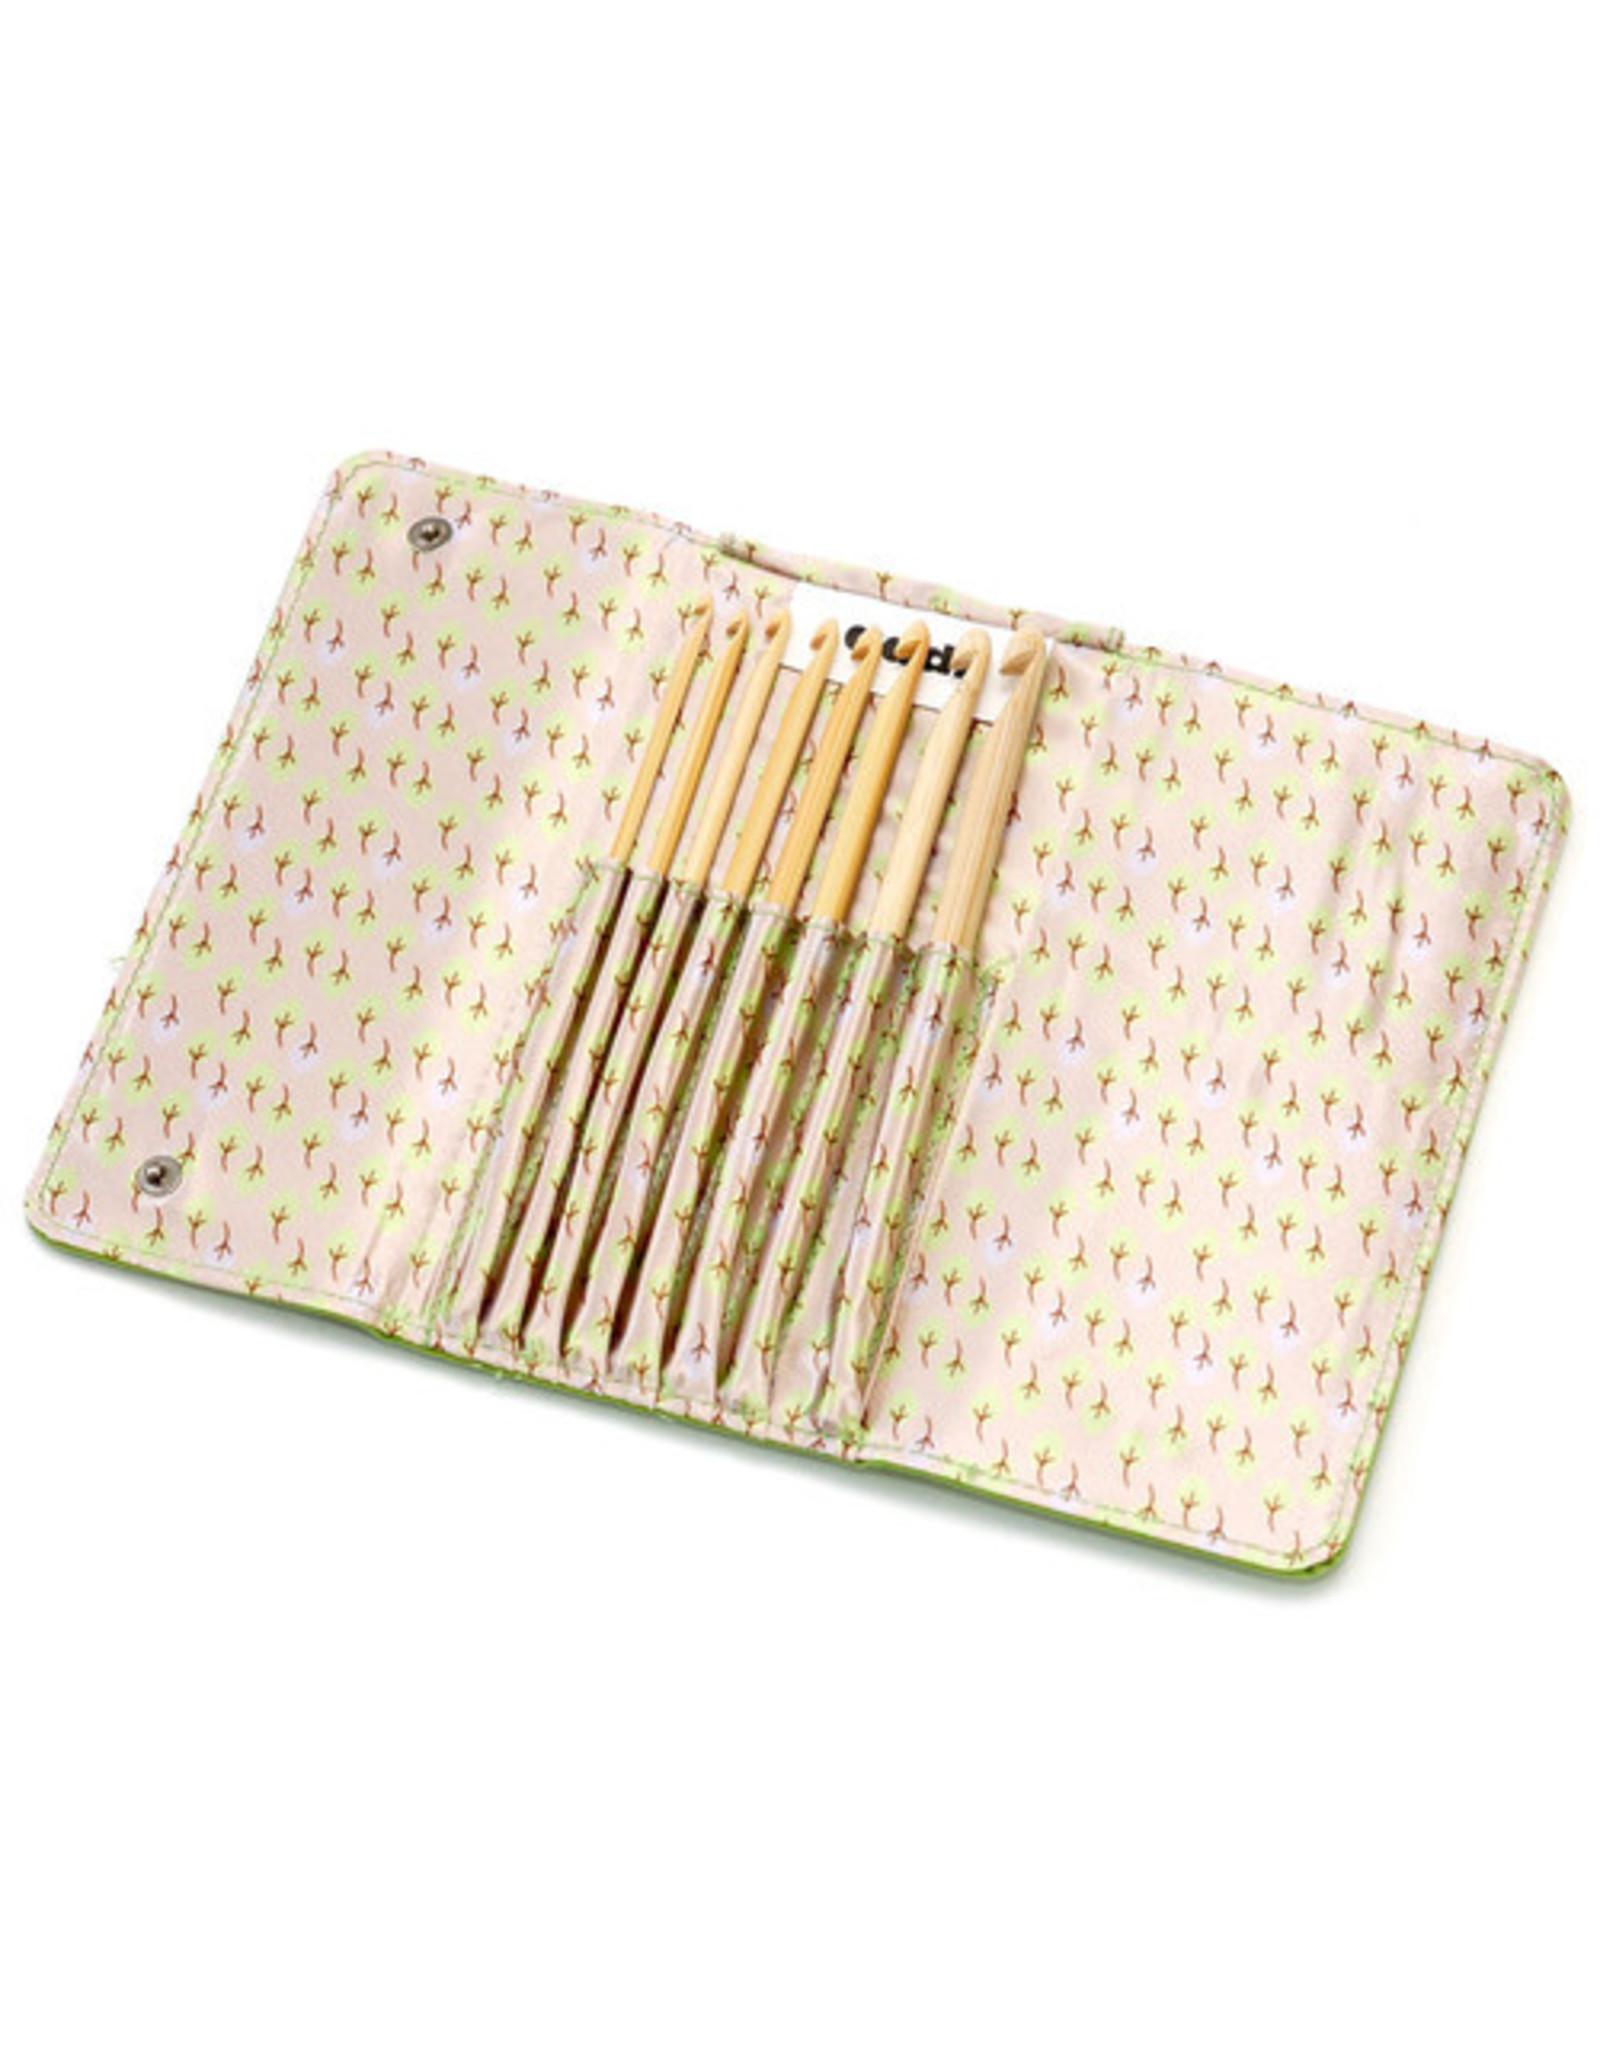 addi addi Click Bamboo Crochet Hook Set (US E-L)